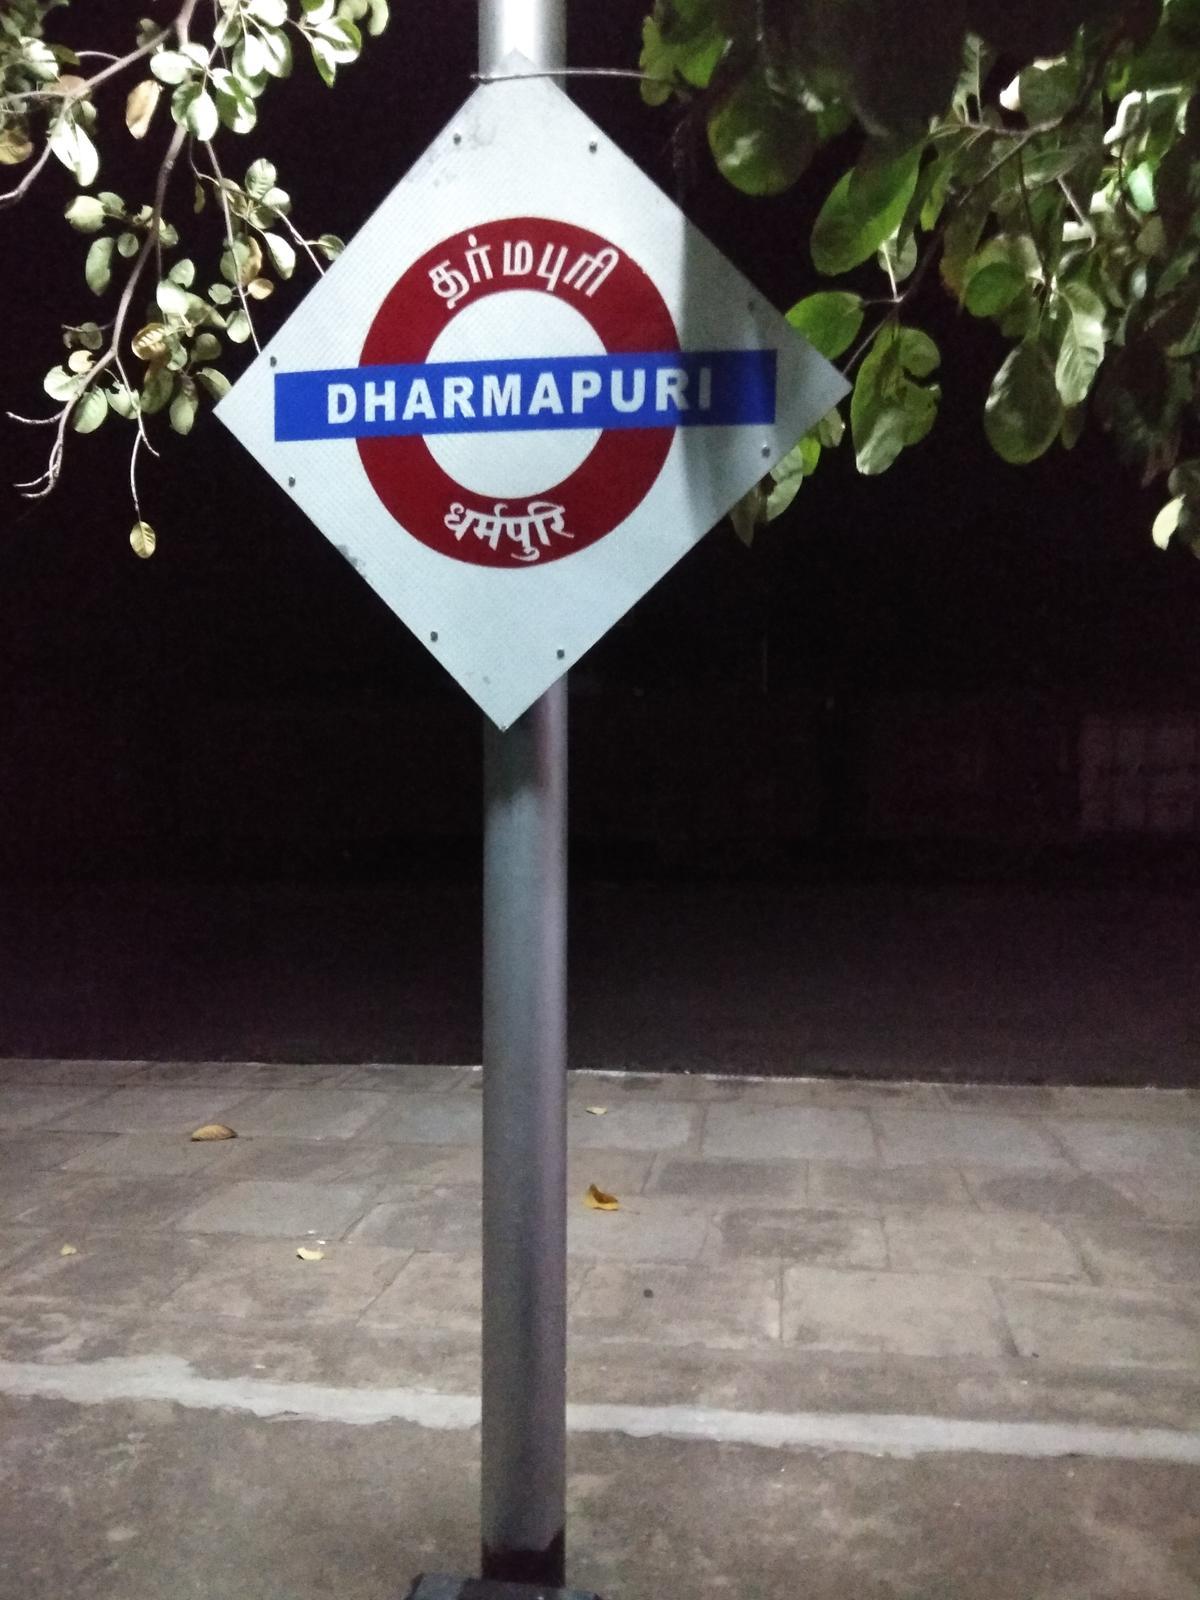 dharmapuri name board க்கான பட முடிவு